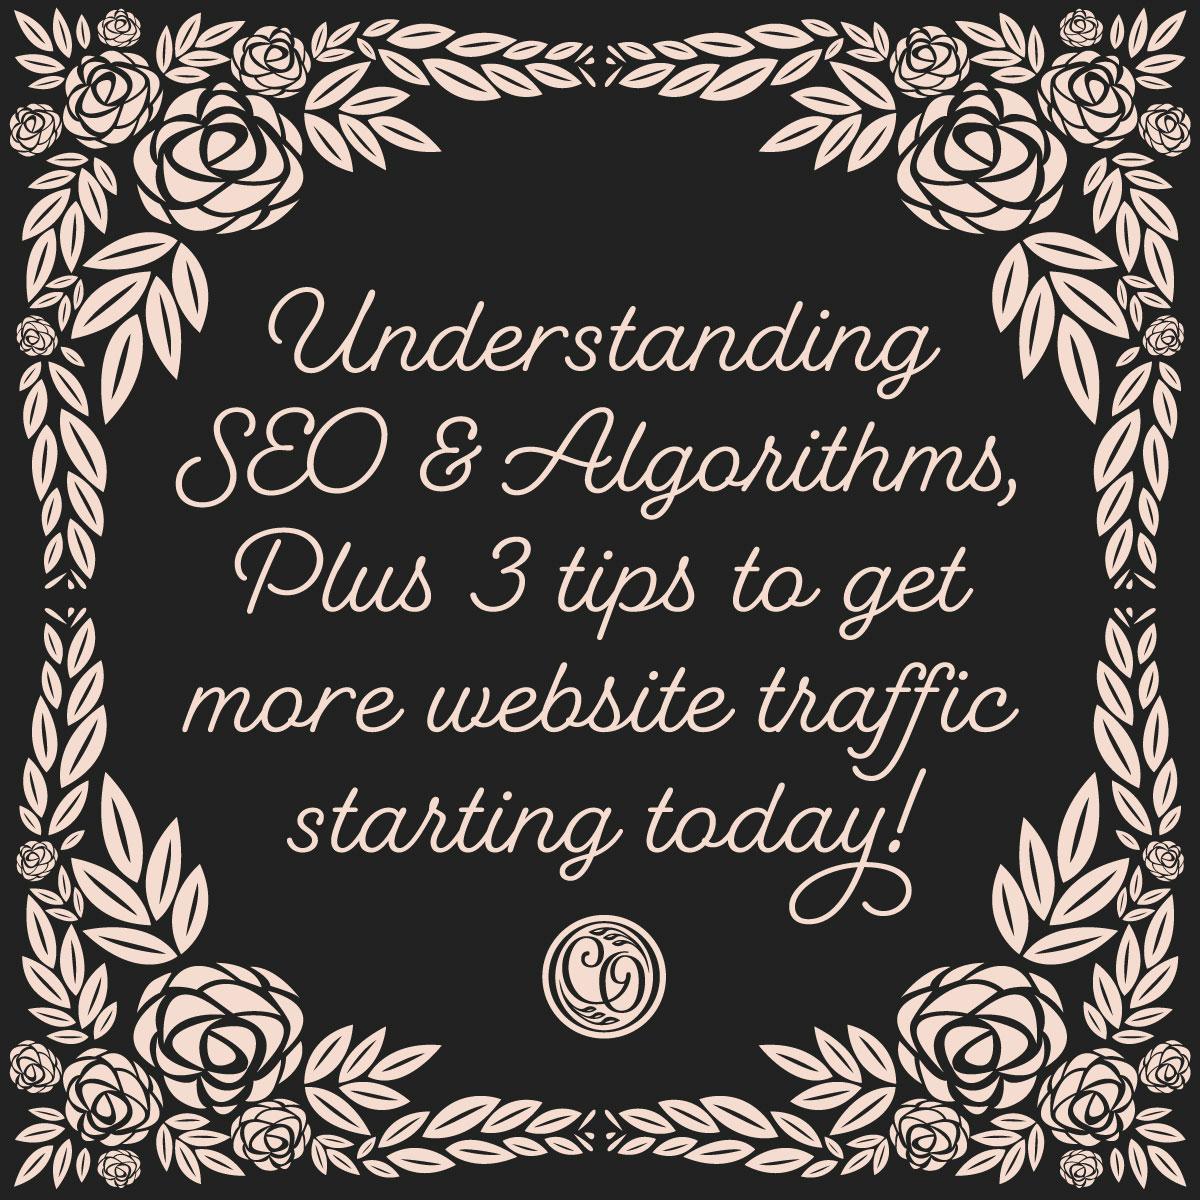 SEO Algorithms